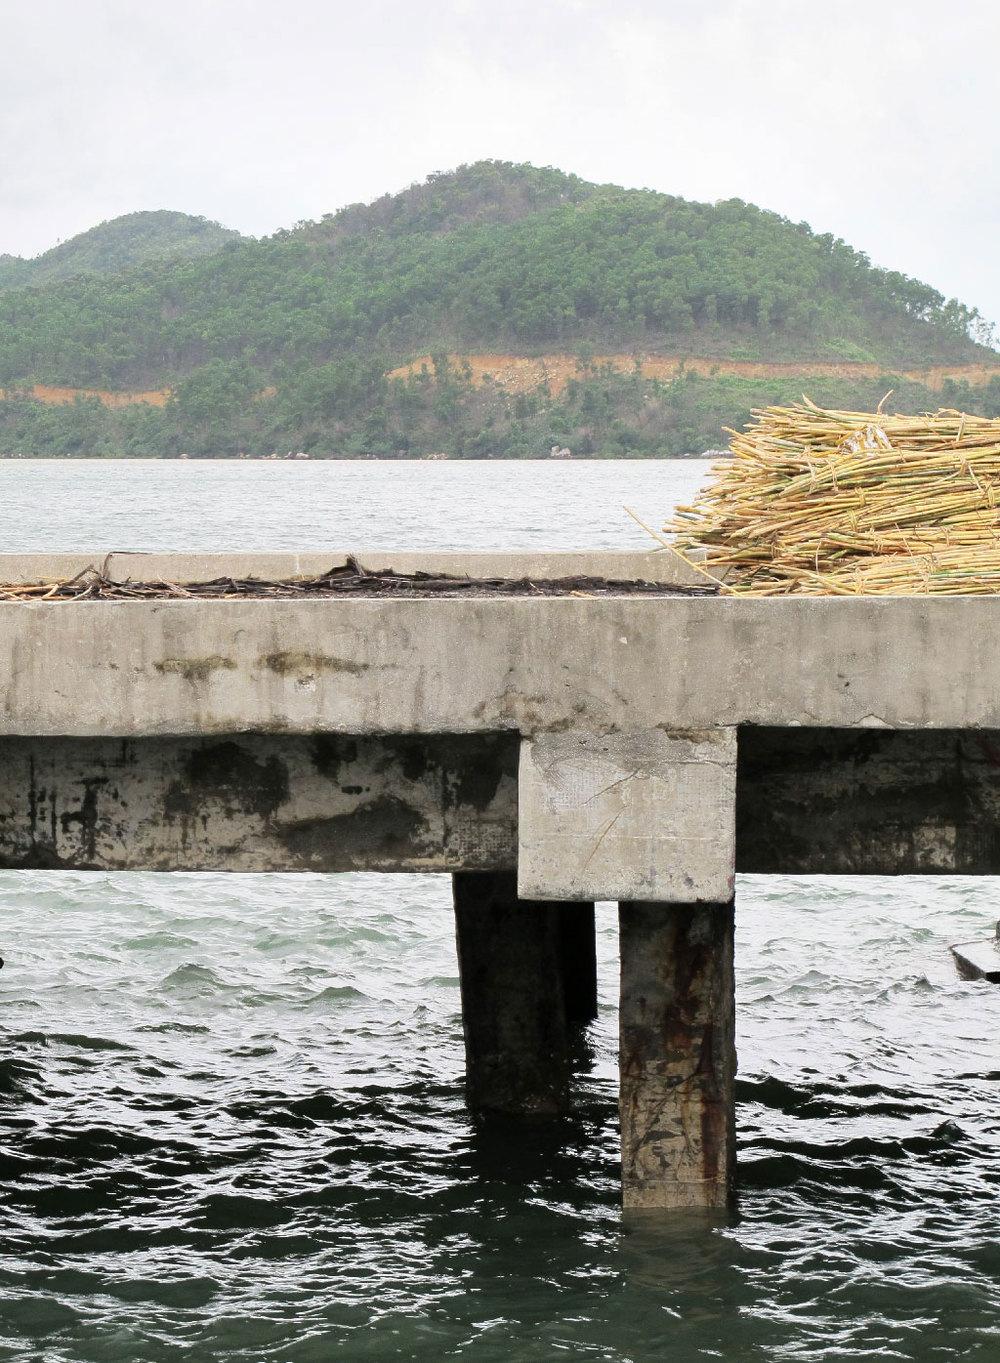 Cement pedestal with bamboo load #vietnam / sergivich.com